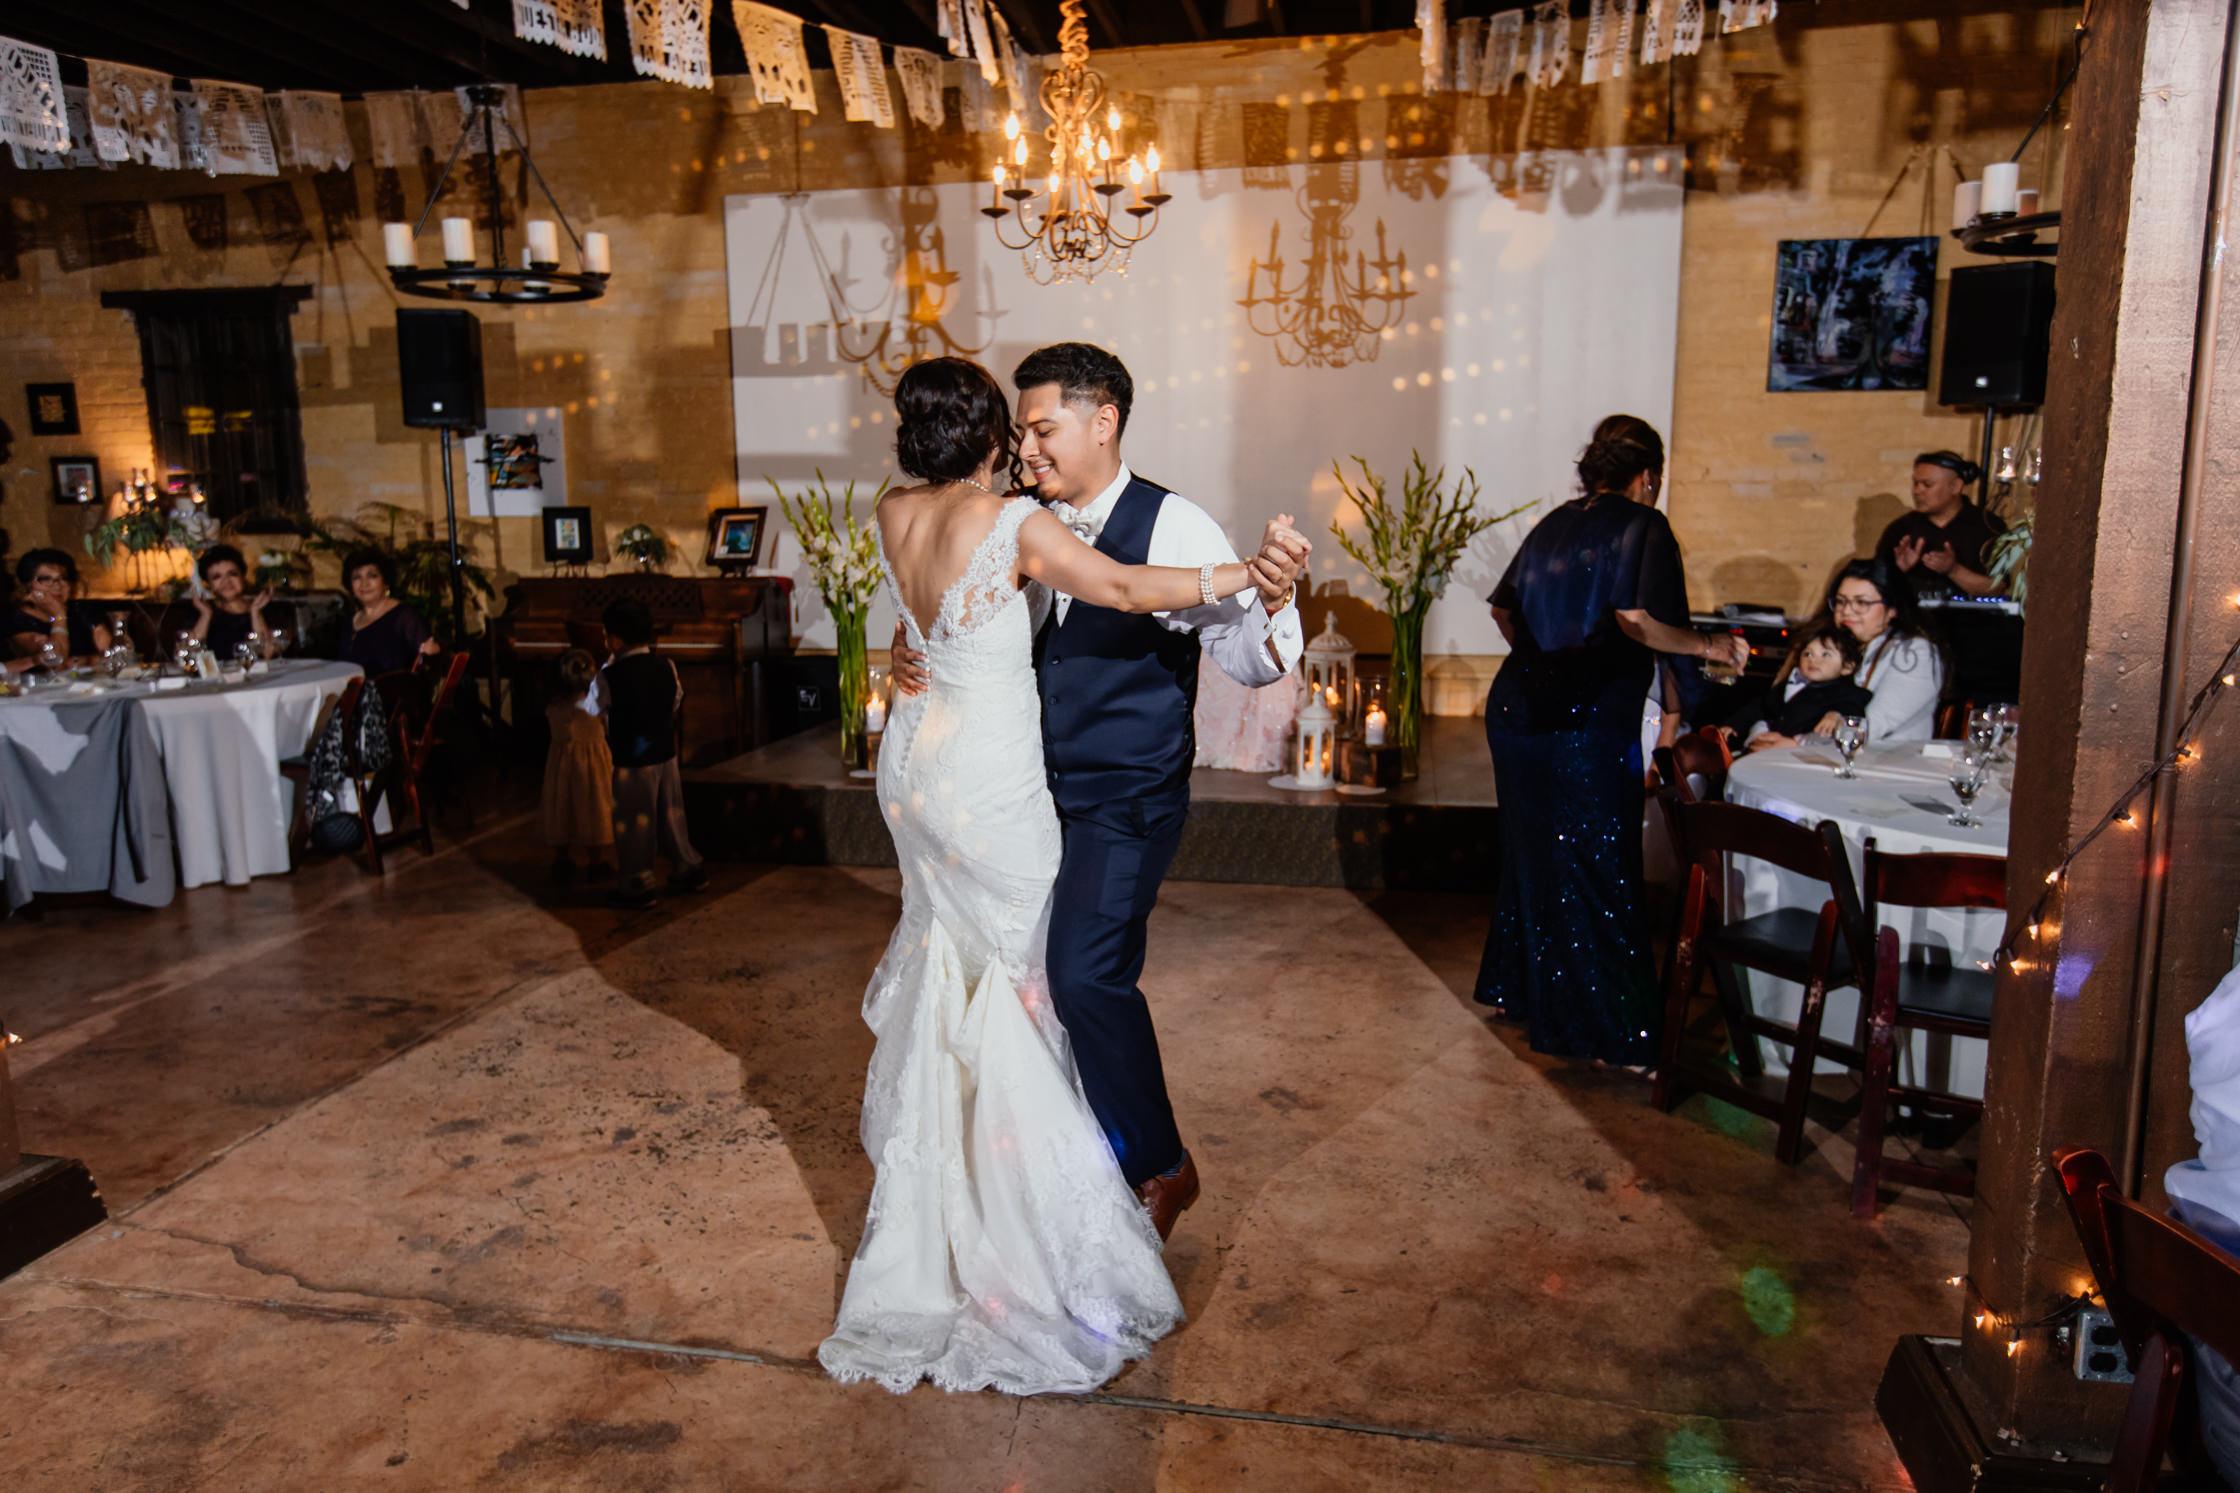 luis_joanna_wedding-109.jpg